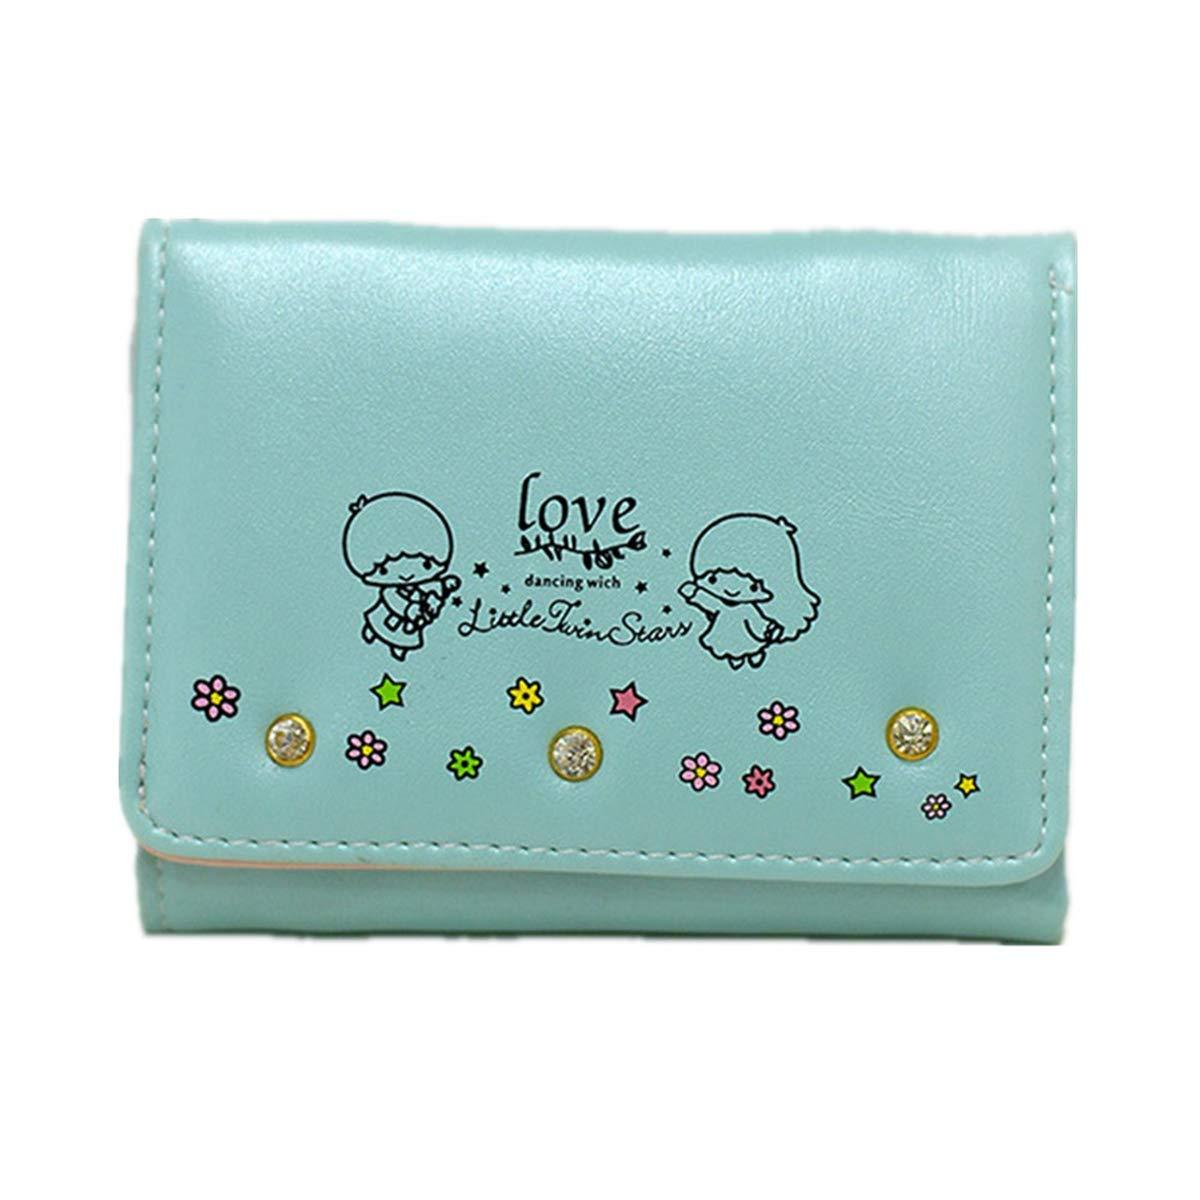 Women Soft Leather Large Capacity Ladies Purse Card Holder